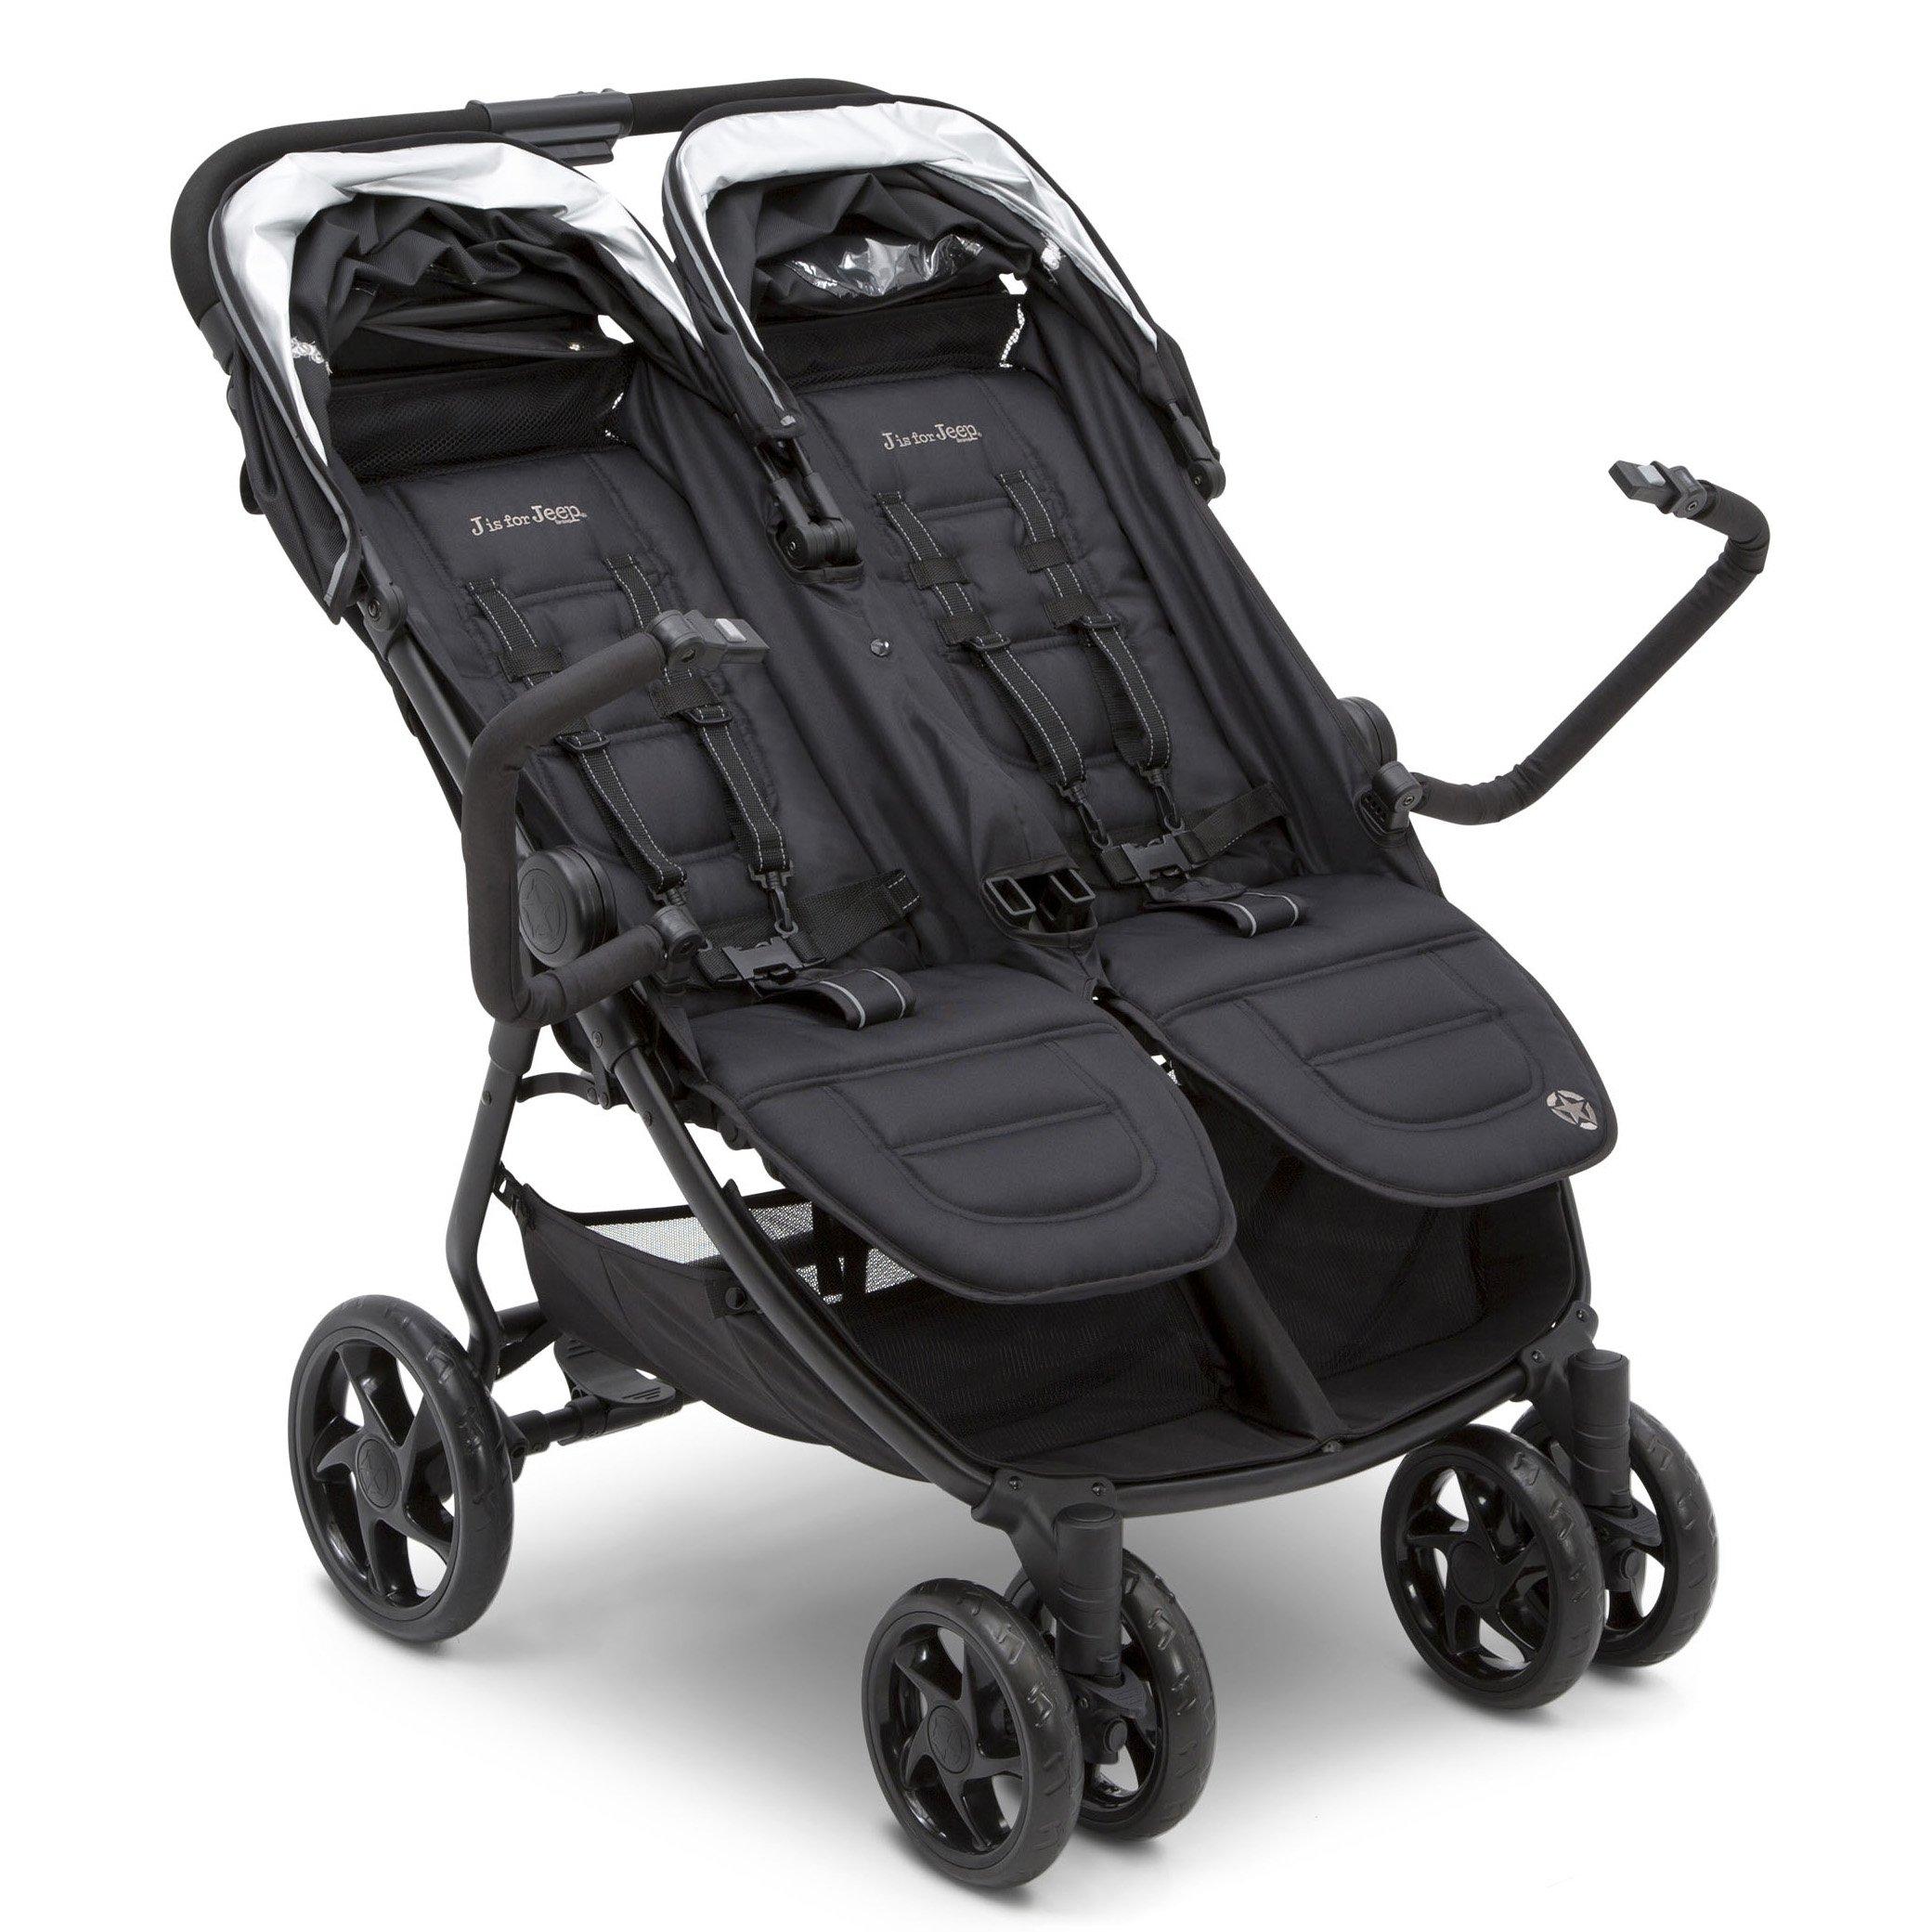 Jeep Destination Ultralight Side x Side Double Stroller, Midnight (Black) by Delta Children (Image #2)